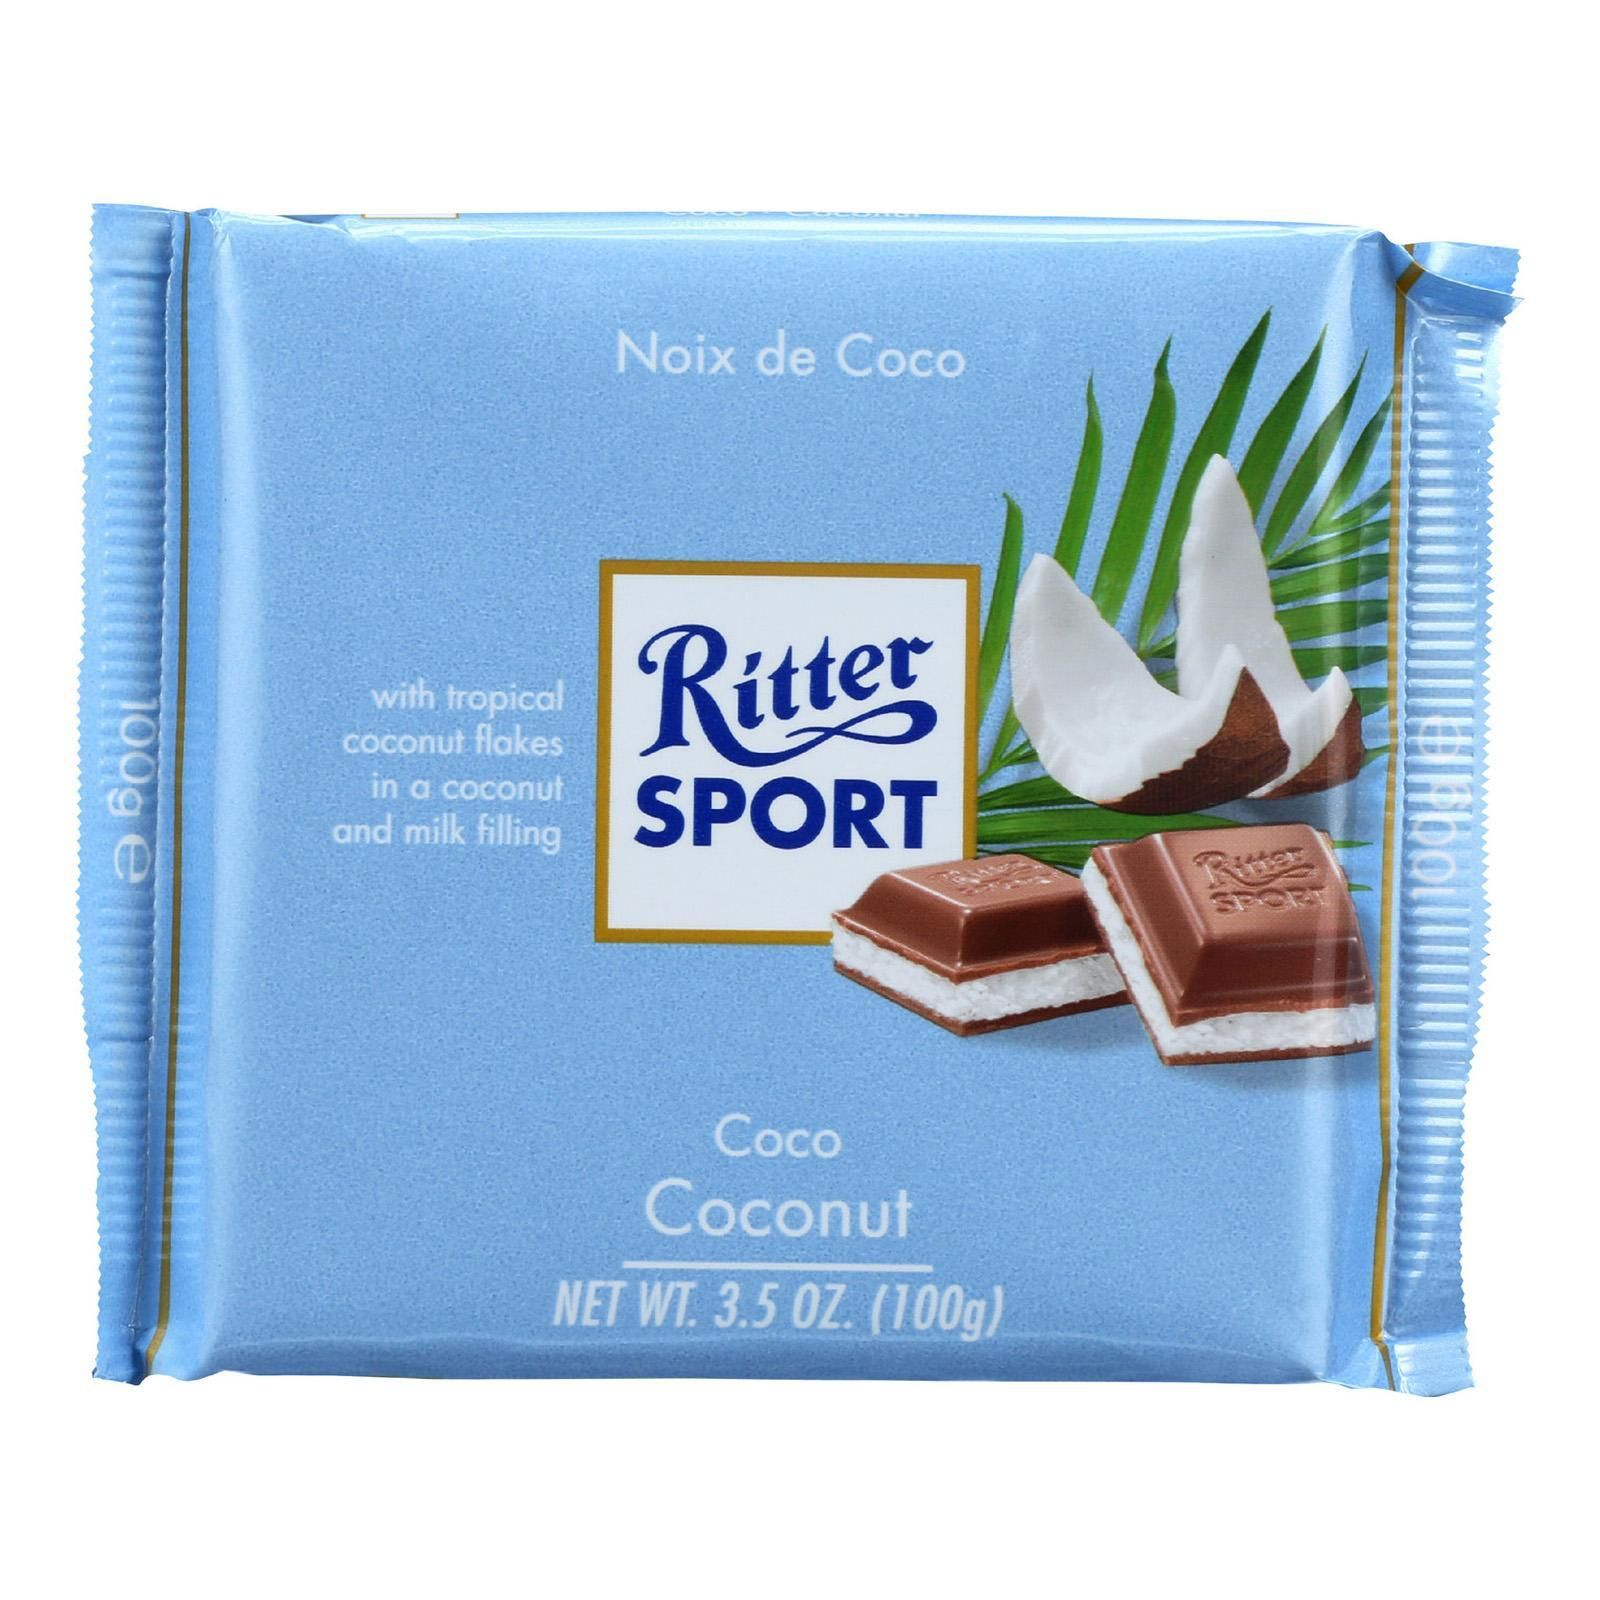 Ritter Sport Chocolate Bar Milk Chocolate Coconut 3